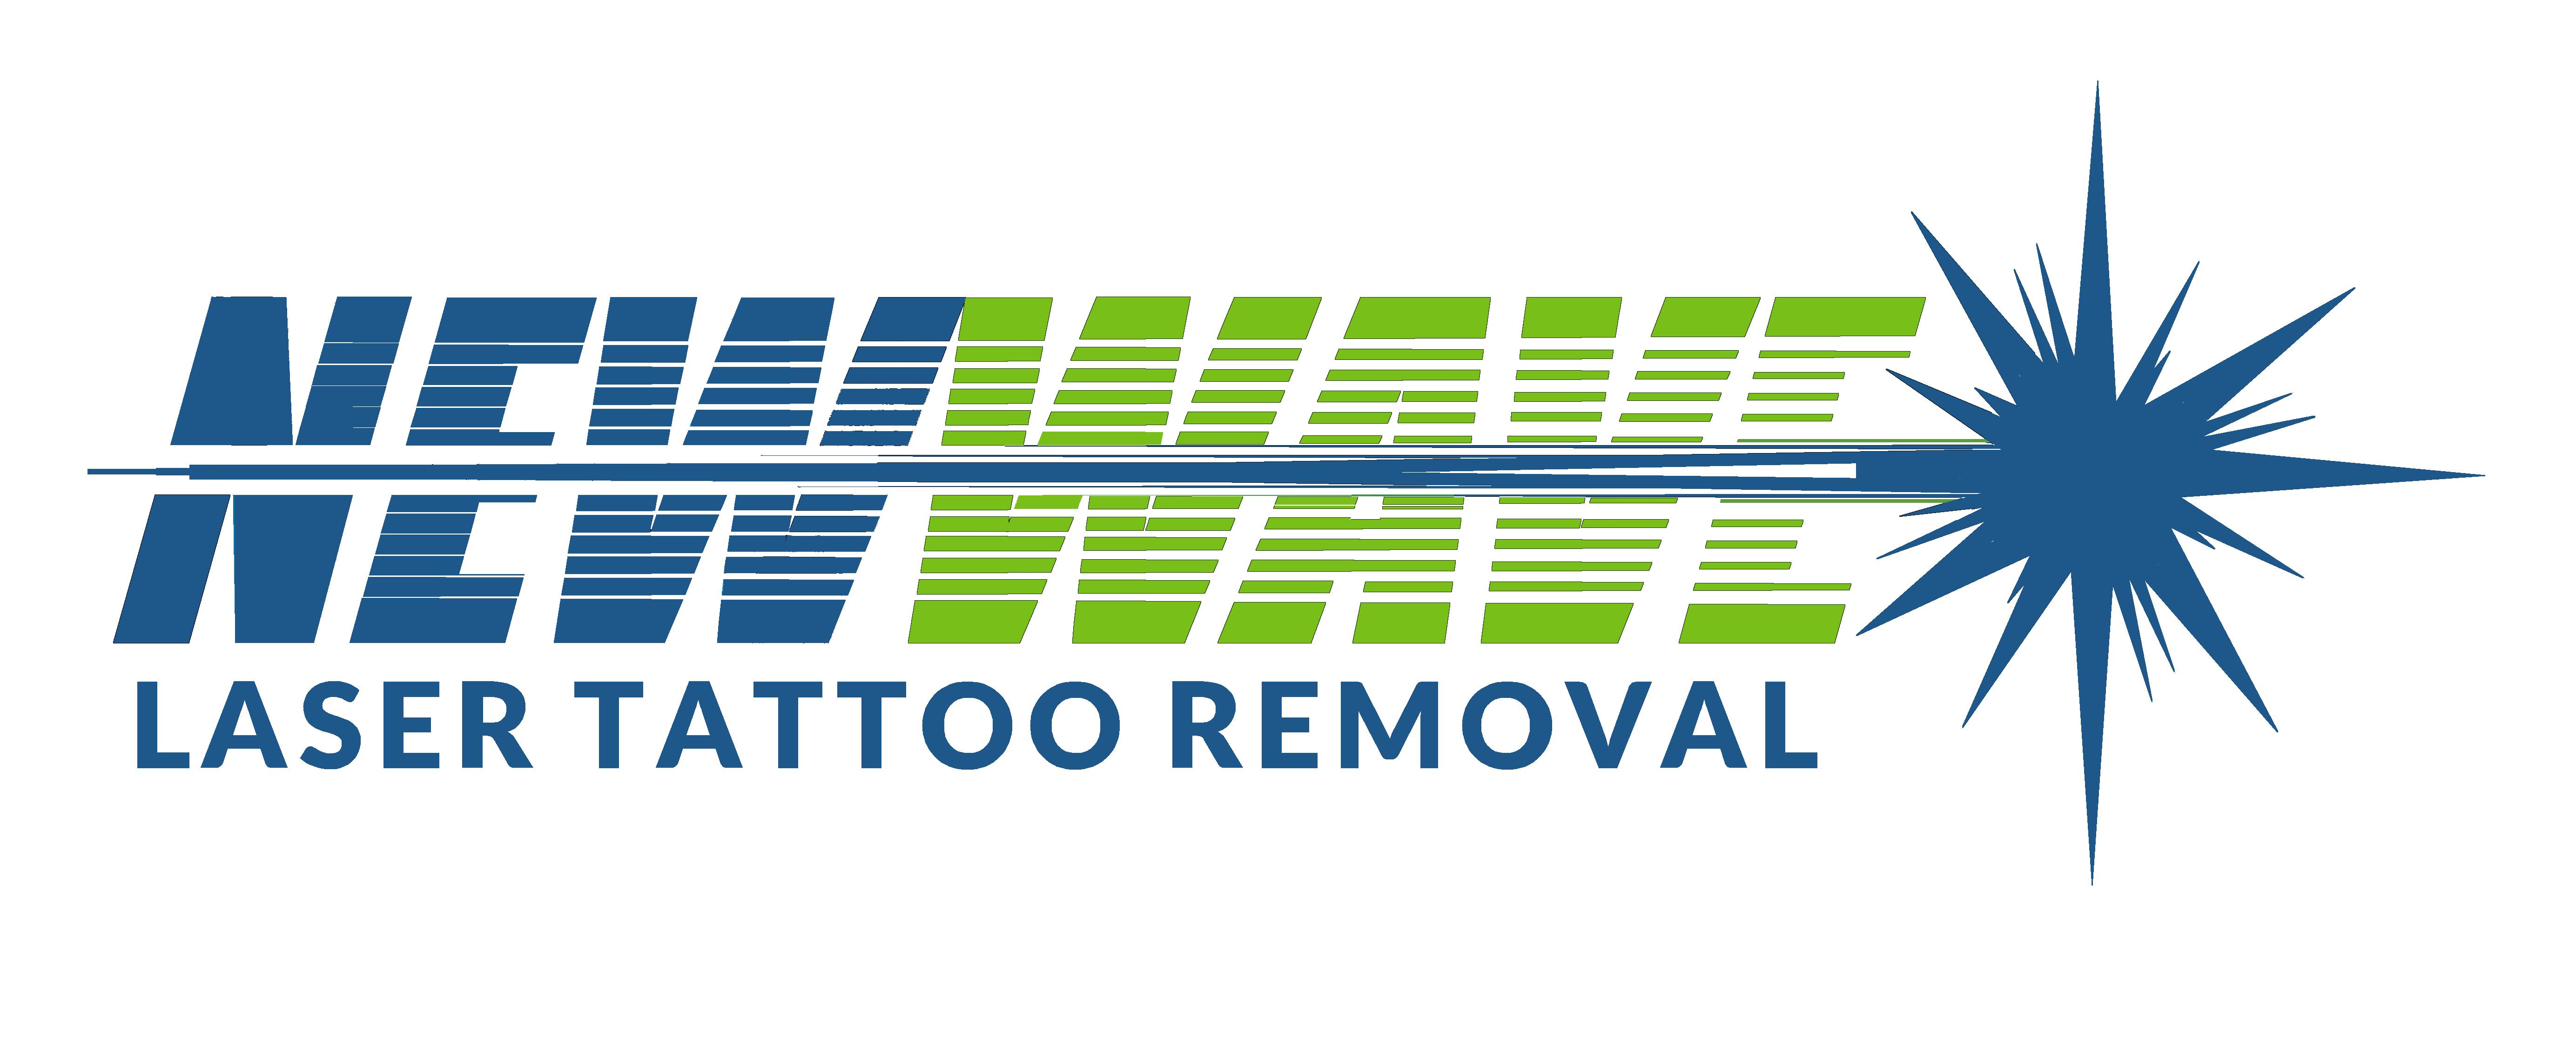 New wave laser tattoo removal bethlehem pa tat removal for Tattoo removal nj